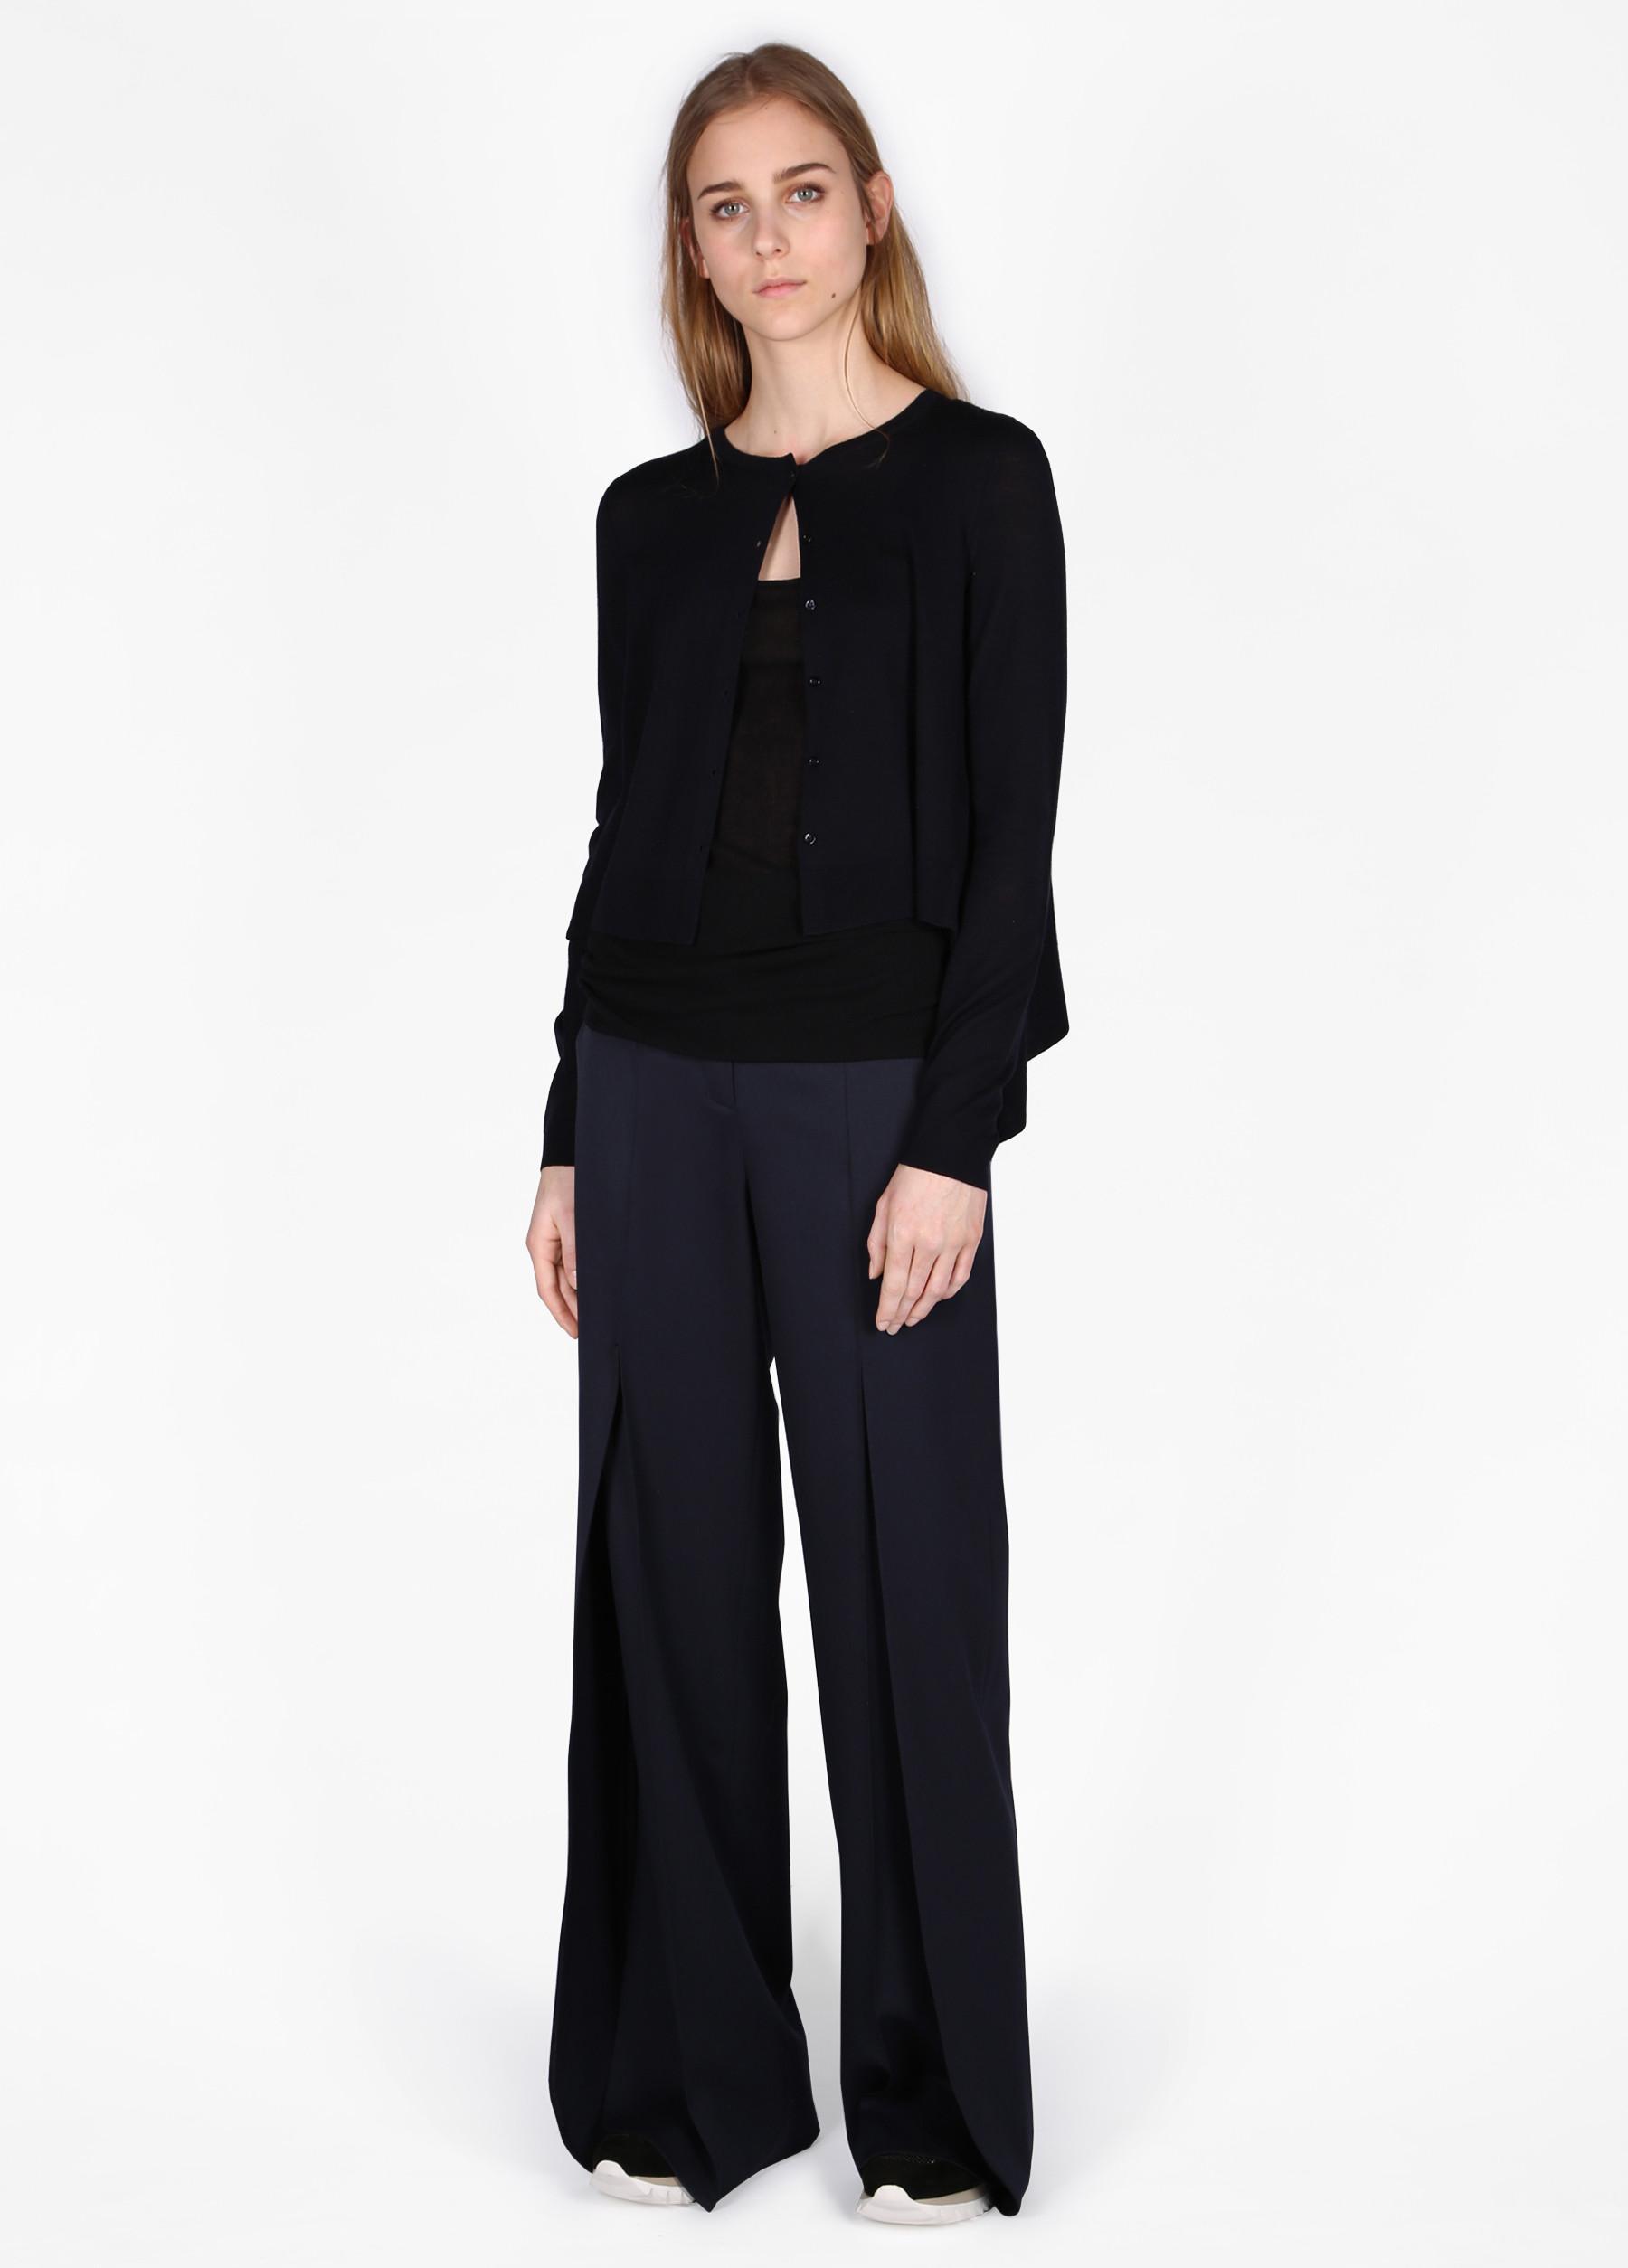 Black Emporio Armani Men's Pullover Hoodie Kleidung & Accessoires